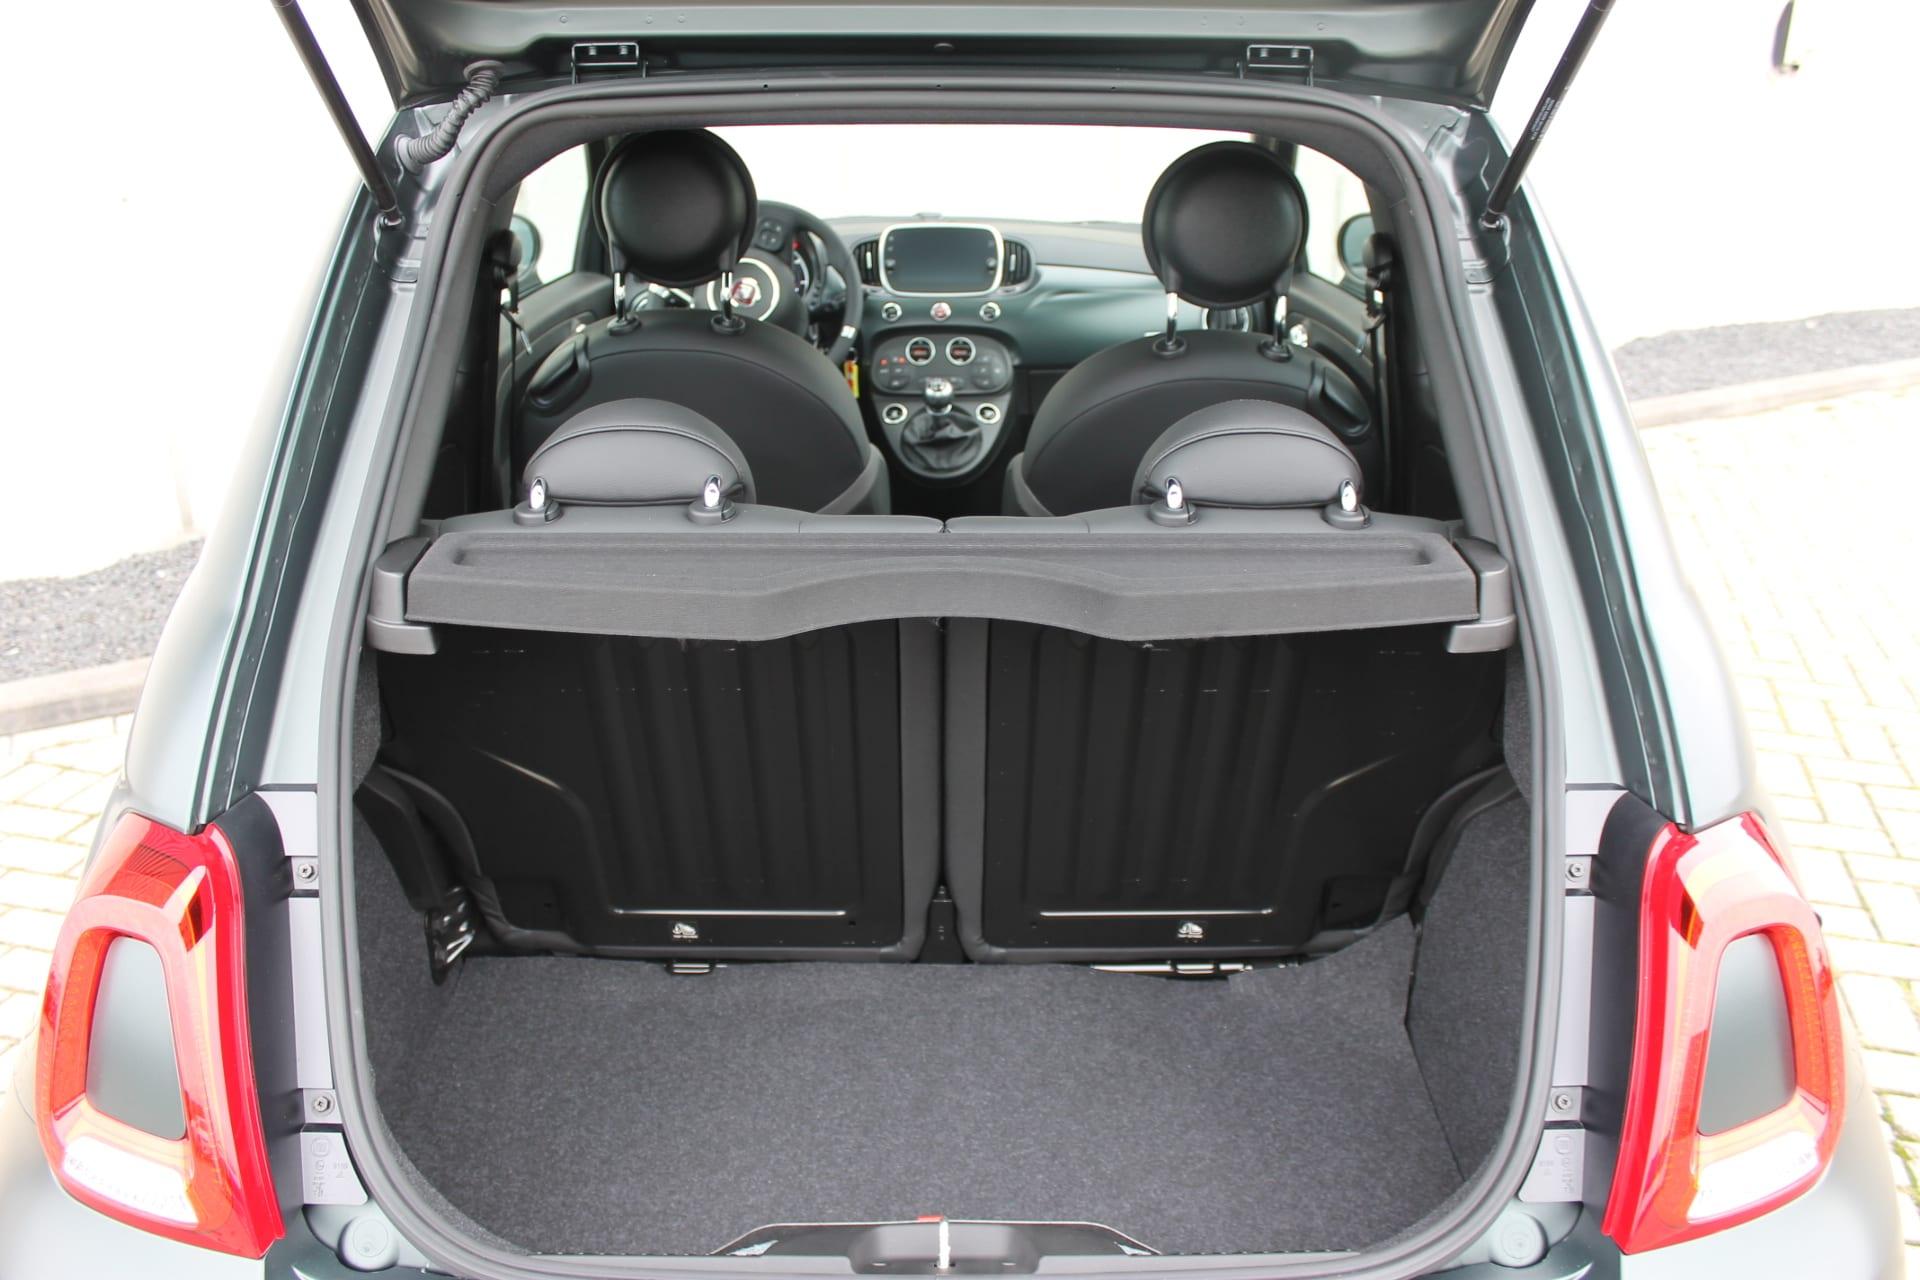 Fiat 500 Rockstar matgroen - kofferbak